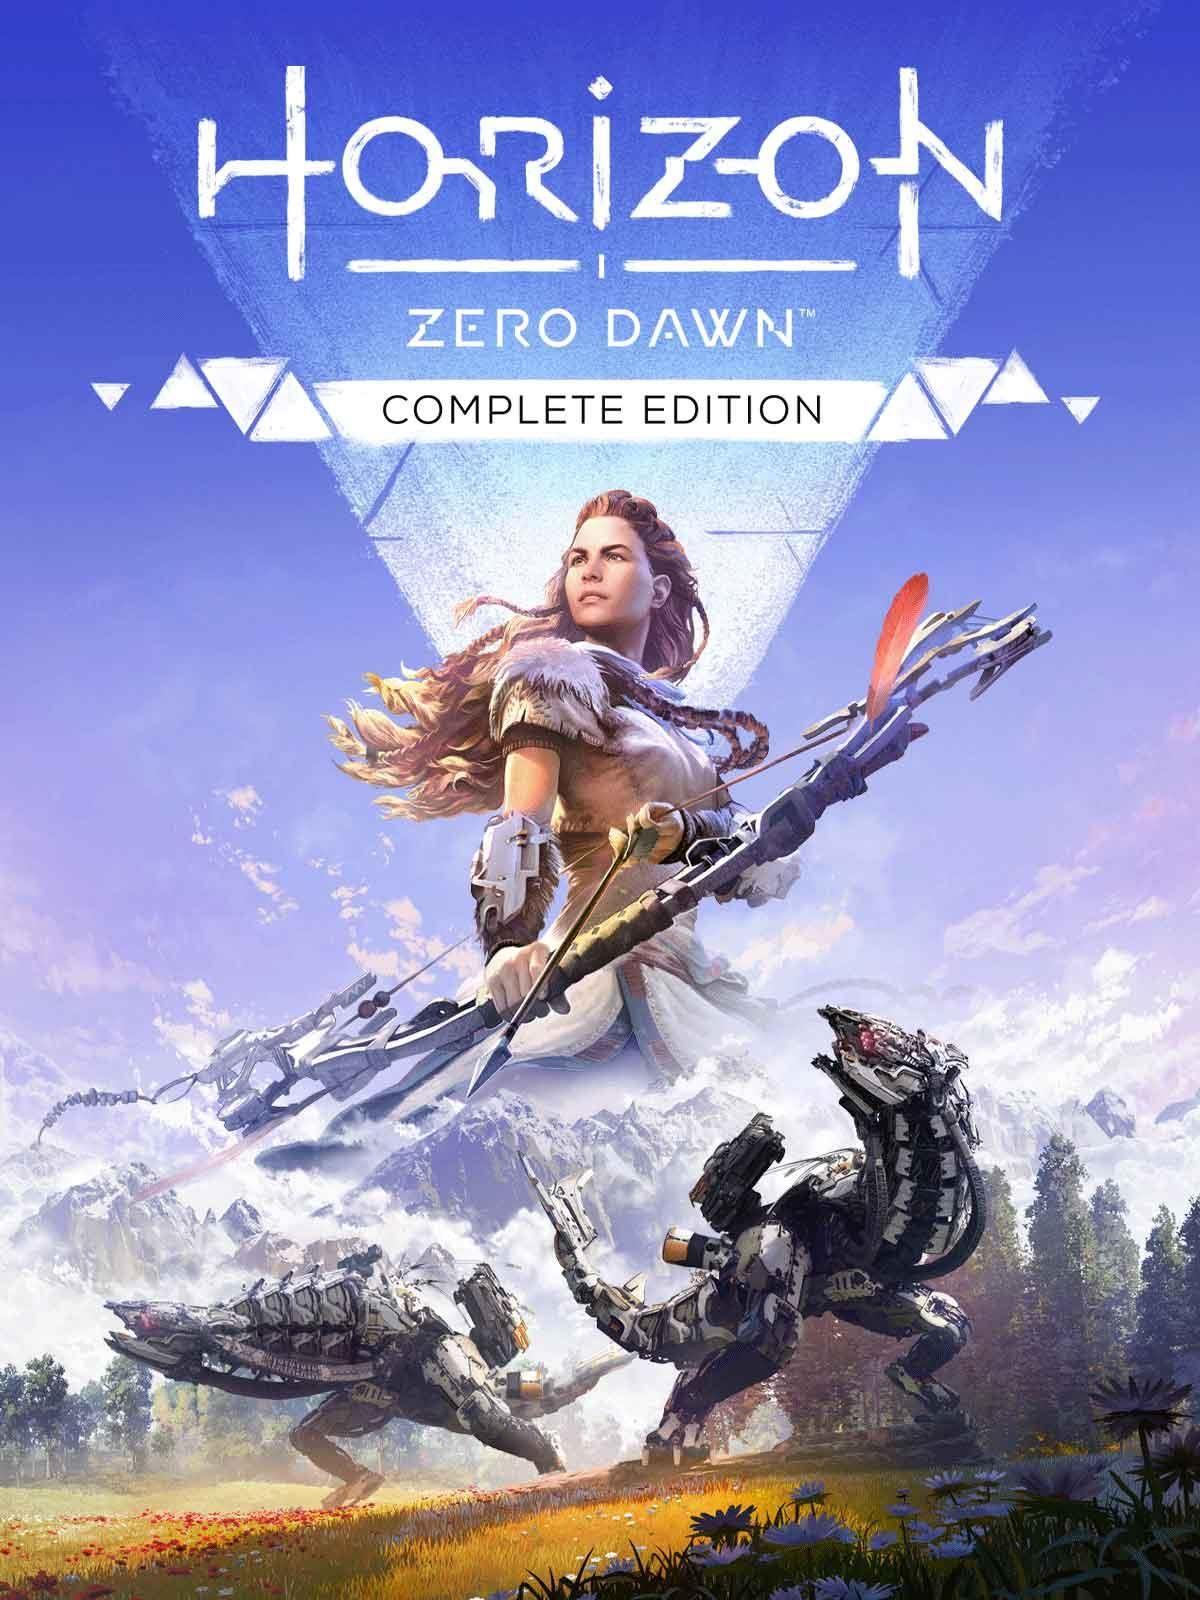 Horizon Zero Dawn Complete Edition Digital Od 91 77 Zl Opinie Ceneo Pl